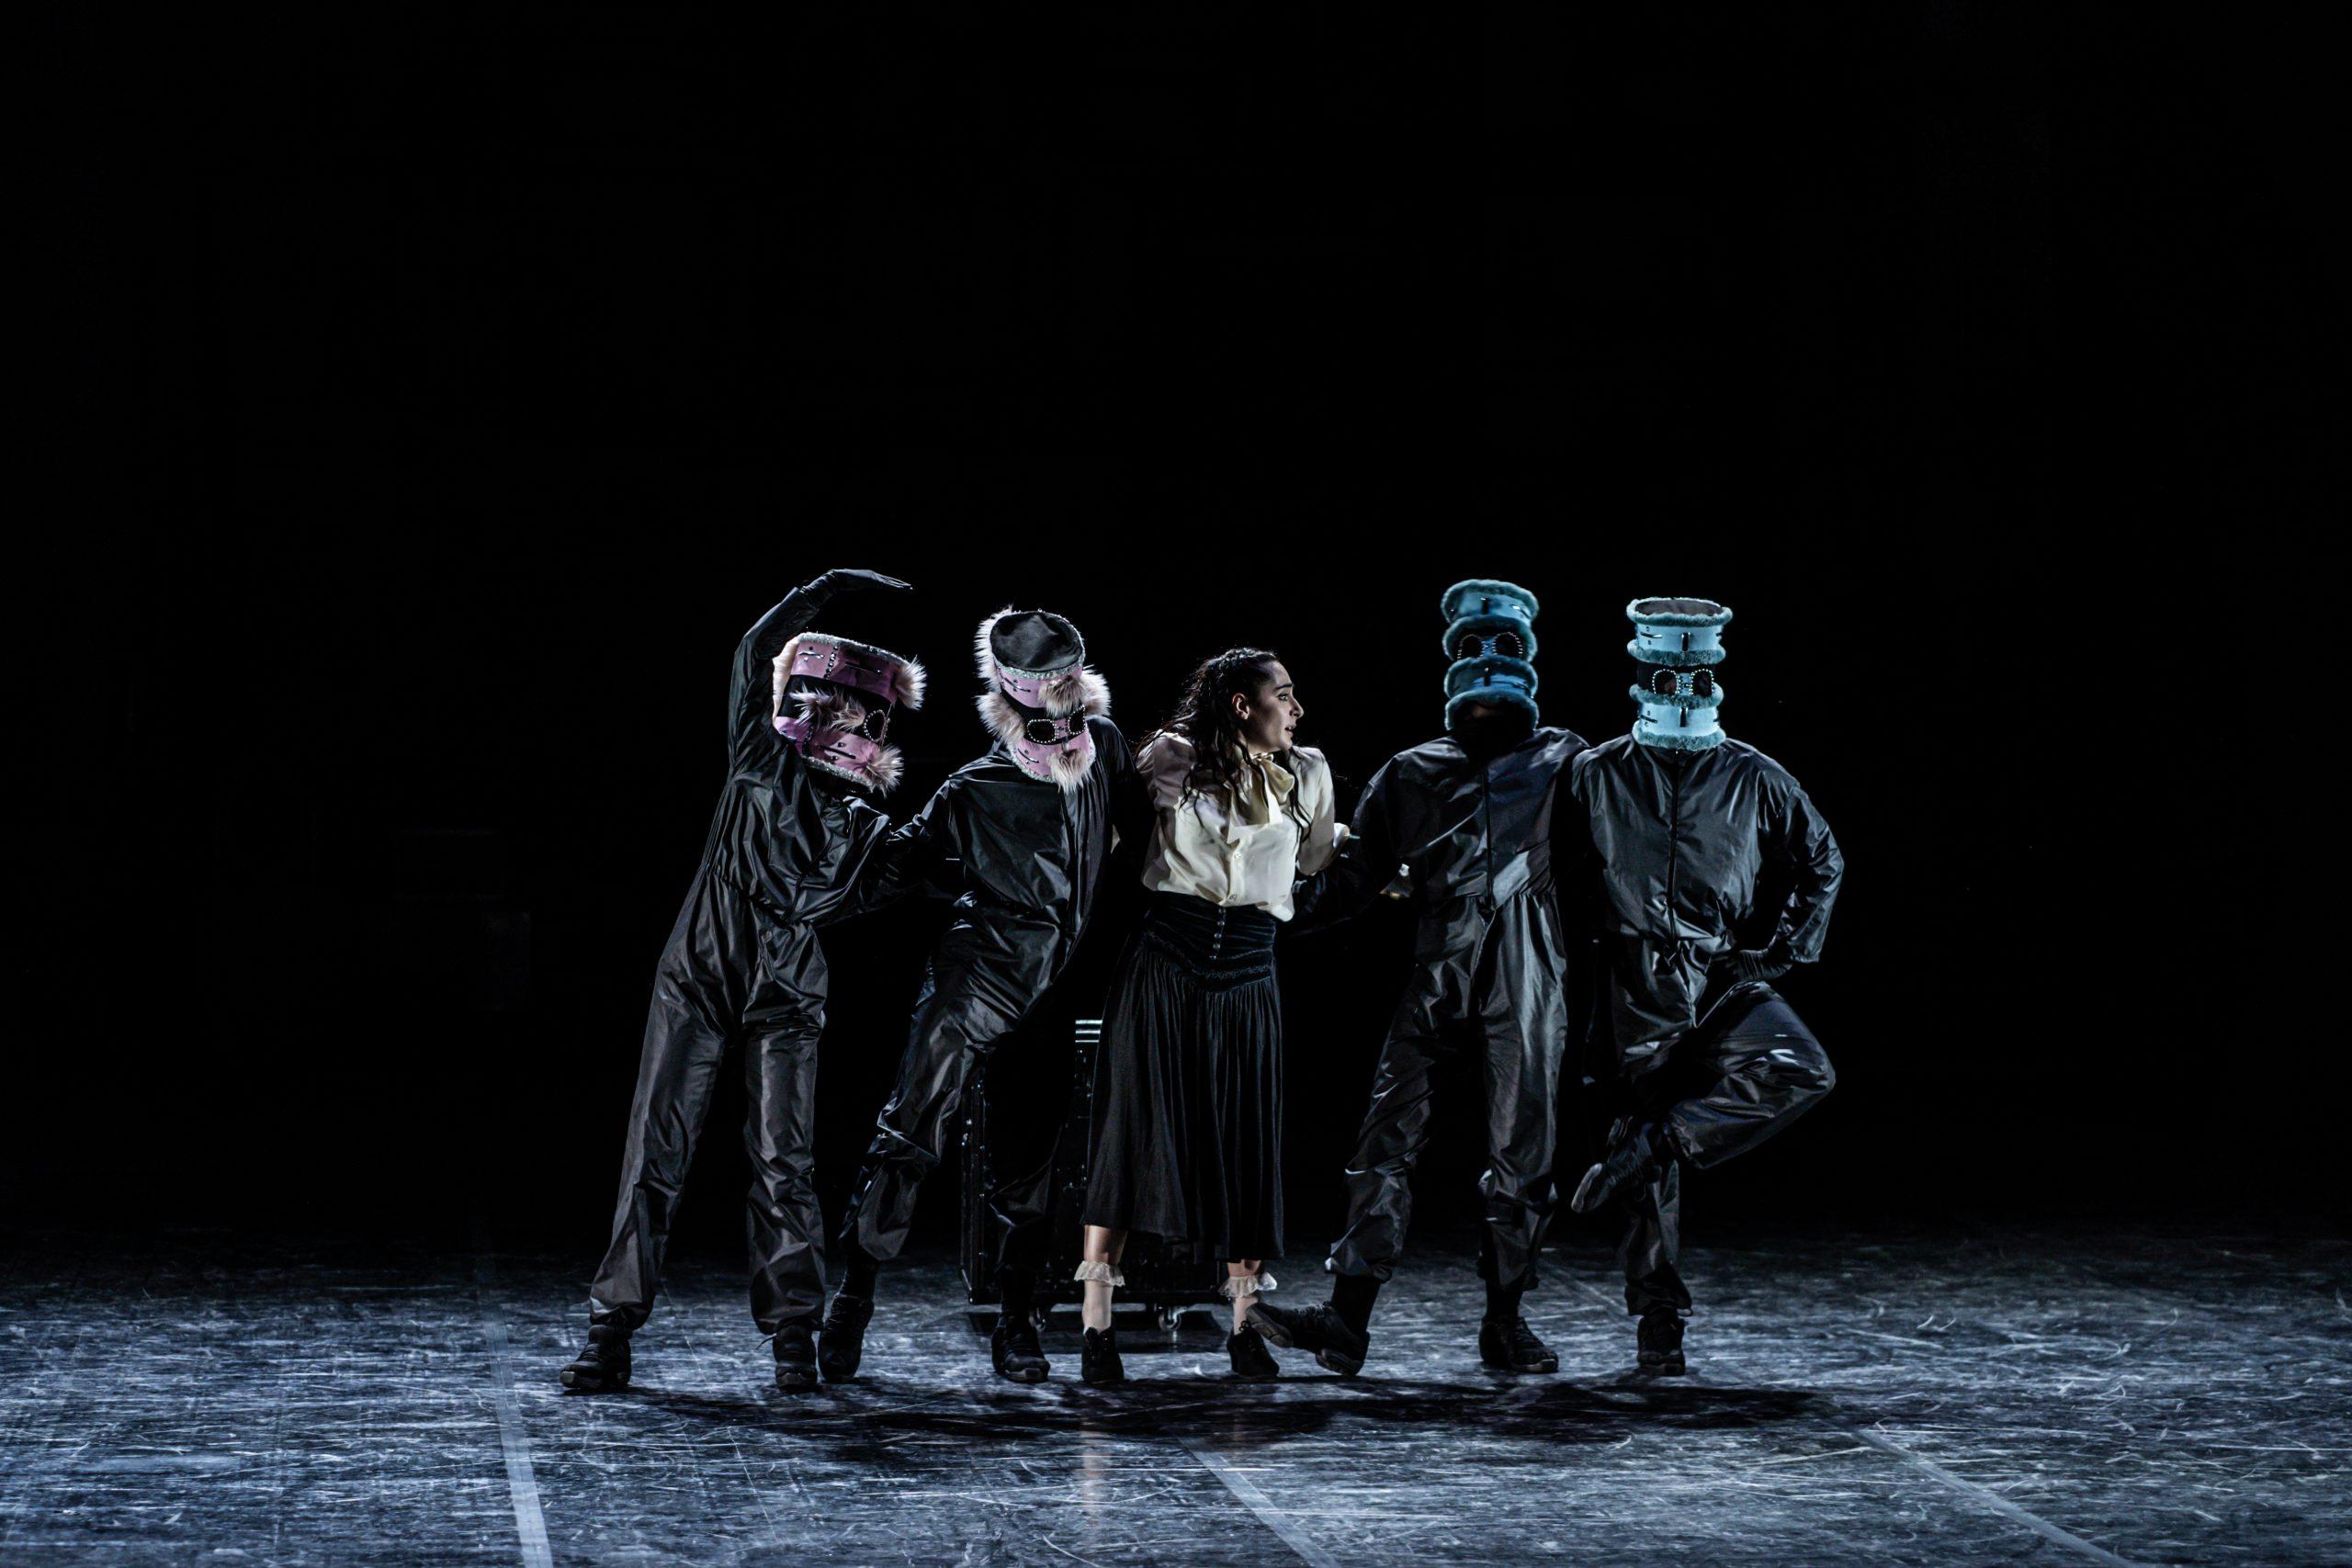 """Puppenspieler"" di Nyko Piscopo in scena al Teatro Bellini venerdì 1 ottobre"